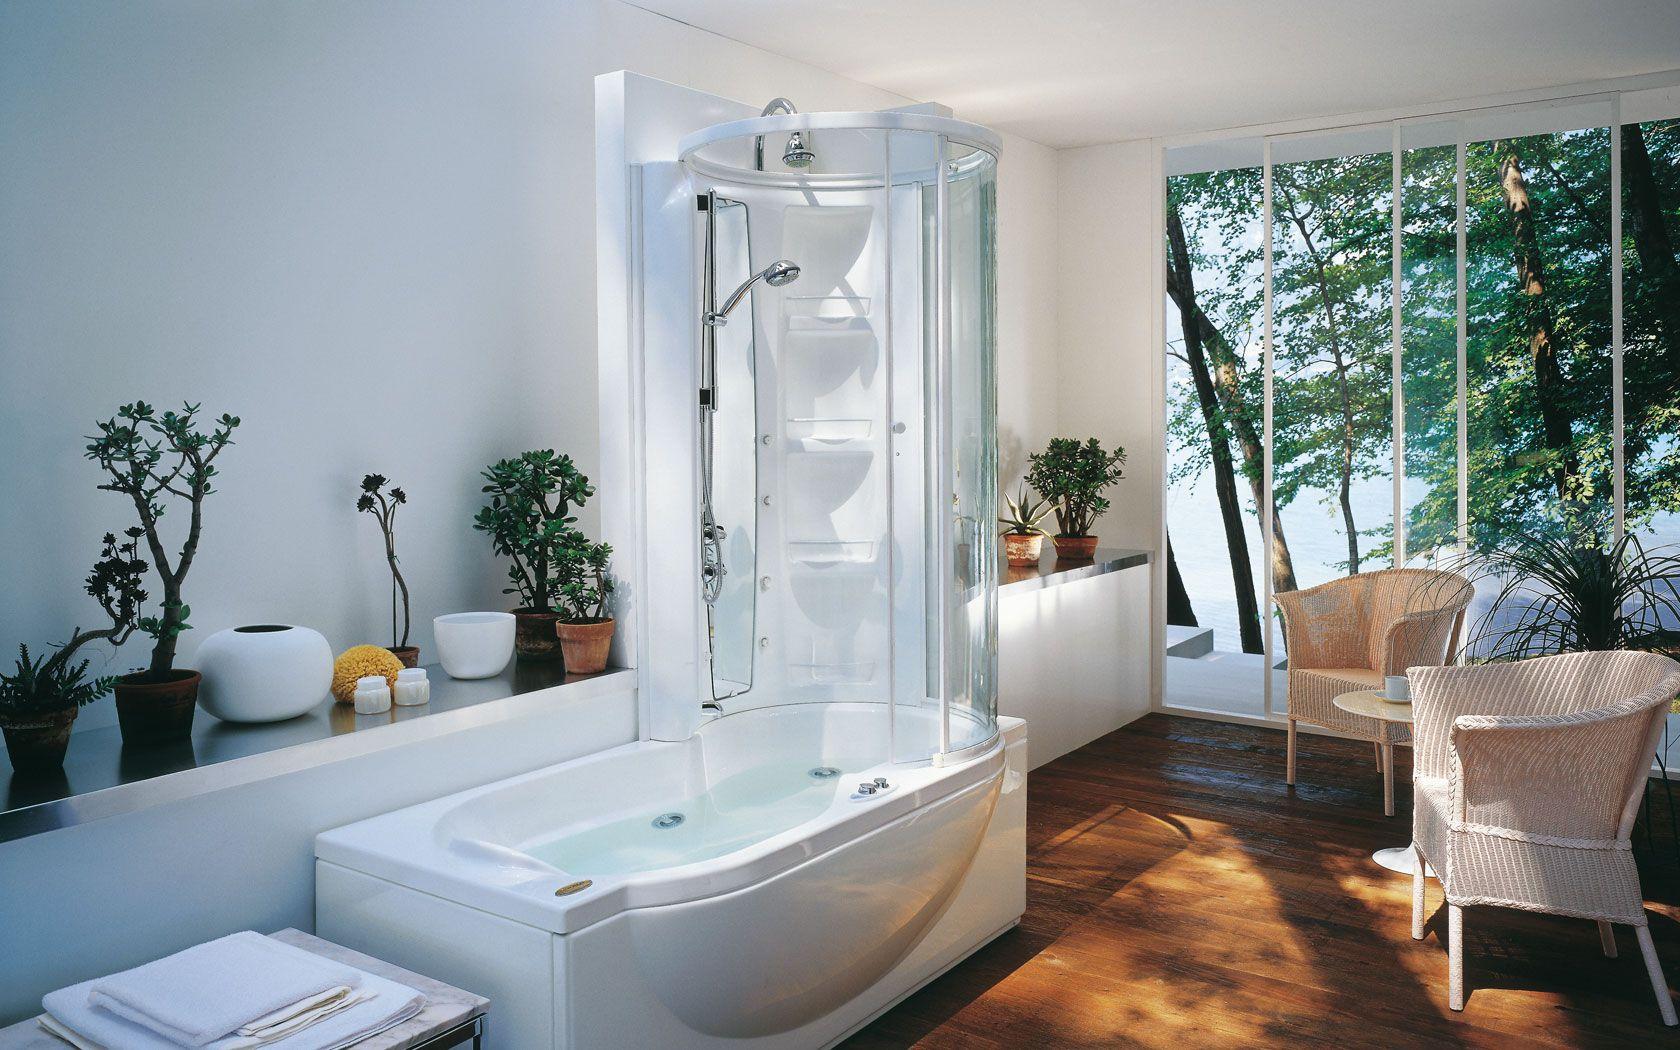 Amea twin premium - Jacuzzi Shower/ Tub Combo   Bathing Room Project ...